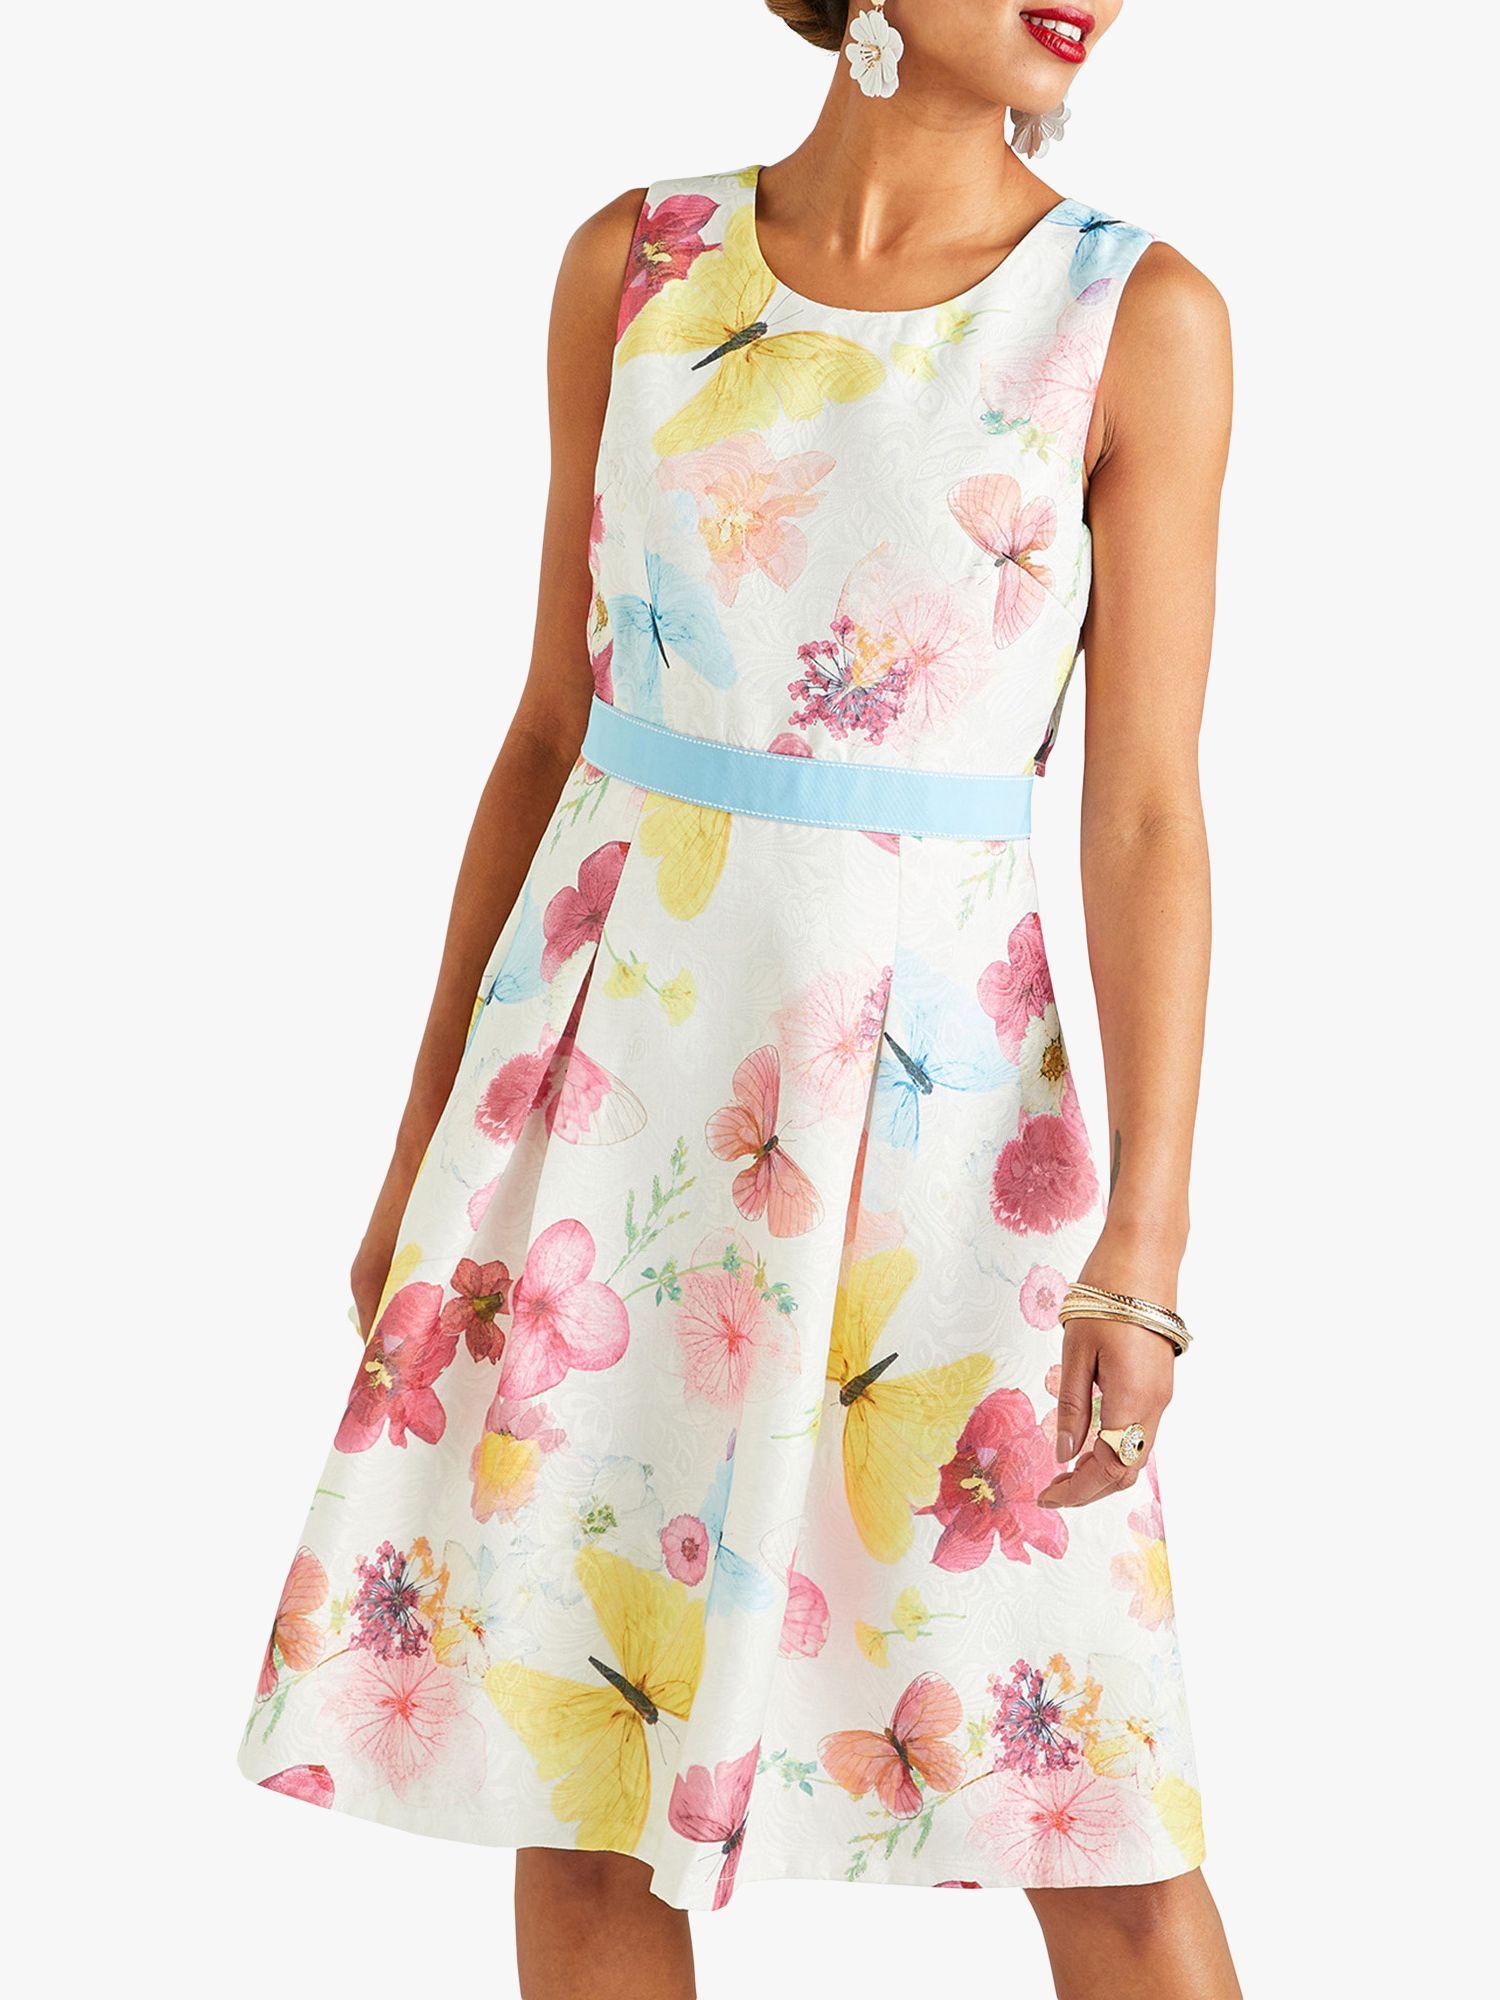 Yumi Yumi Pressed Butterfly Print Jacquard Dress, Ivory/Multi